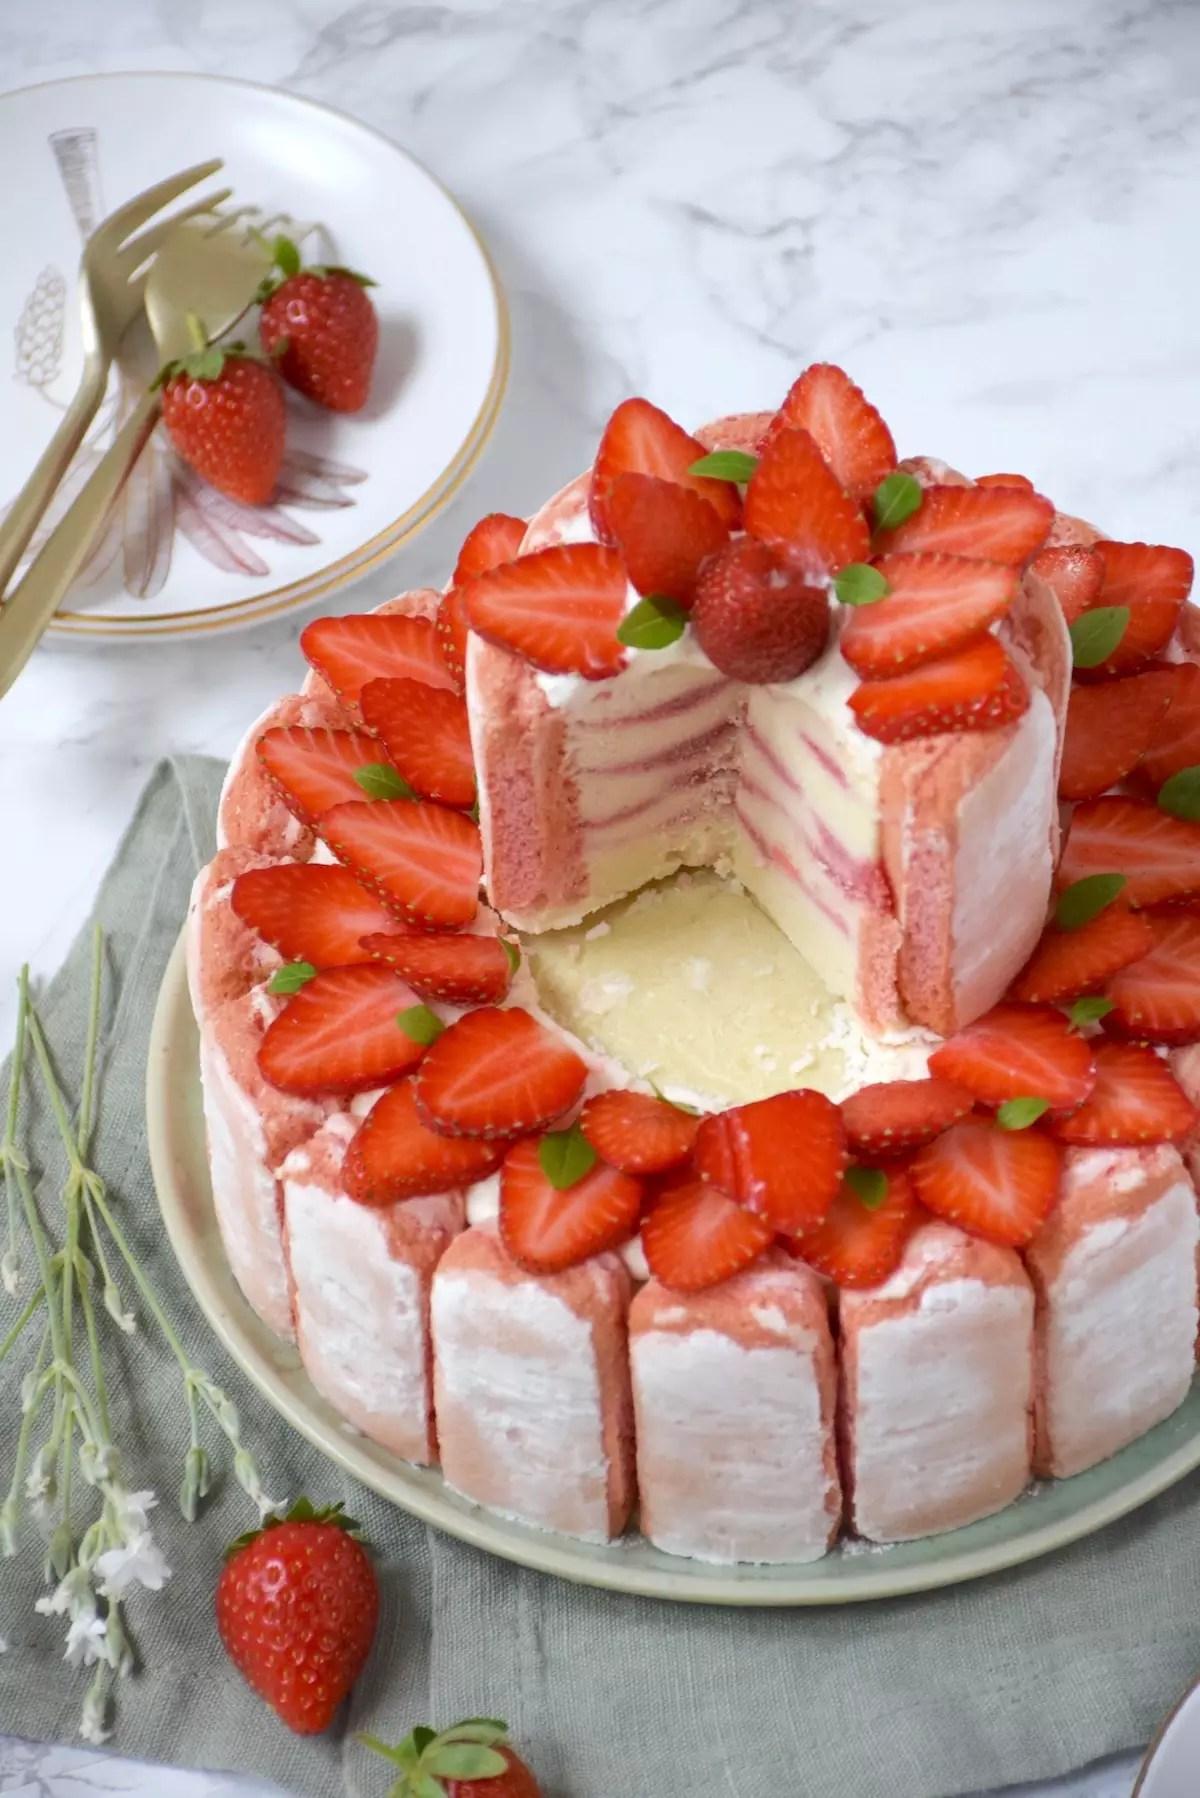 Charlotte glacée rhubarbe yaourt fraise